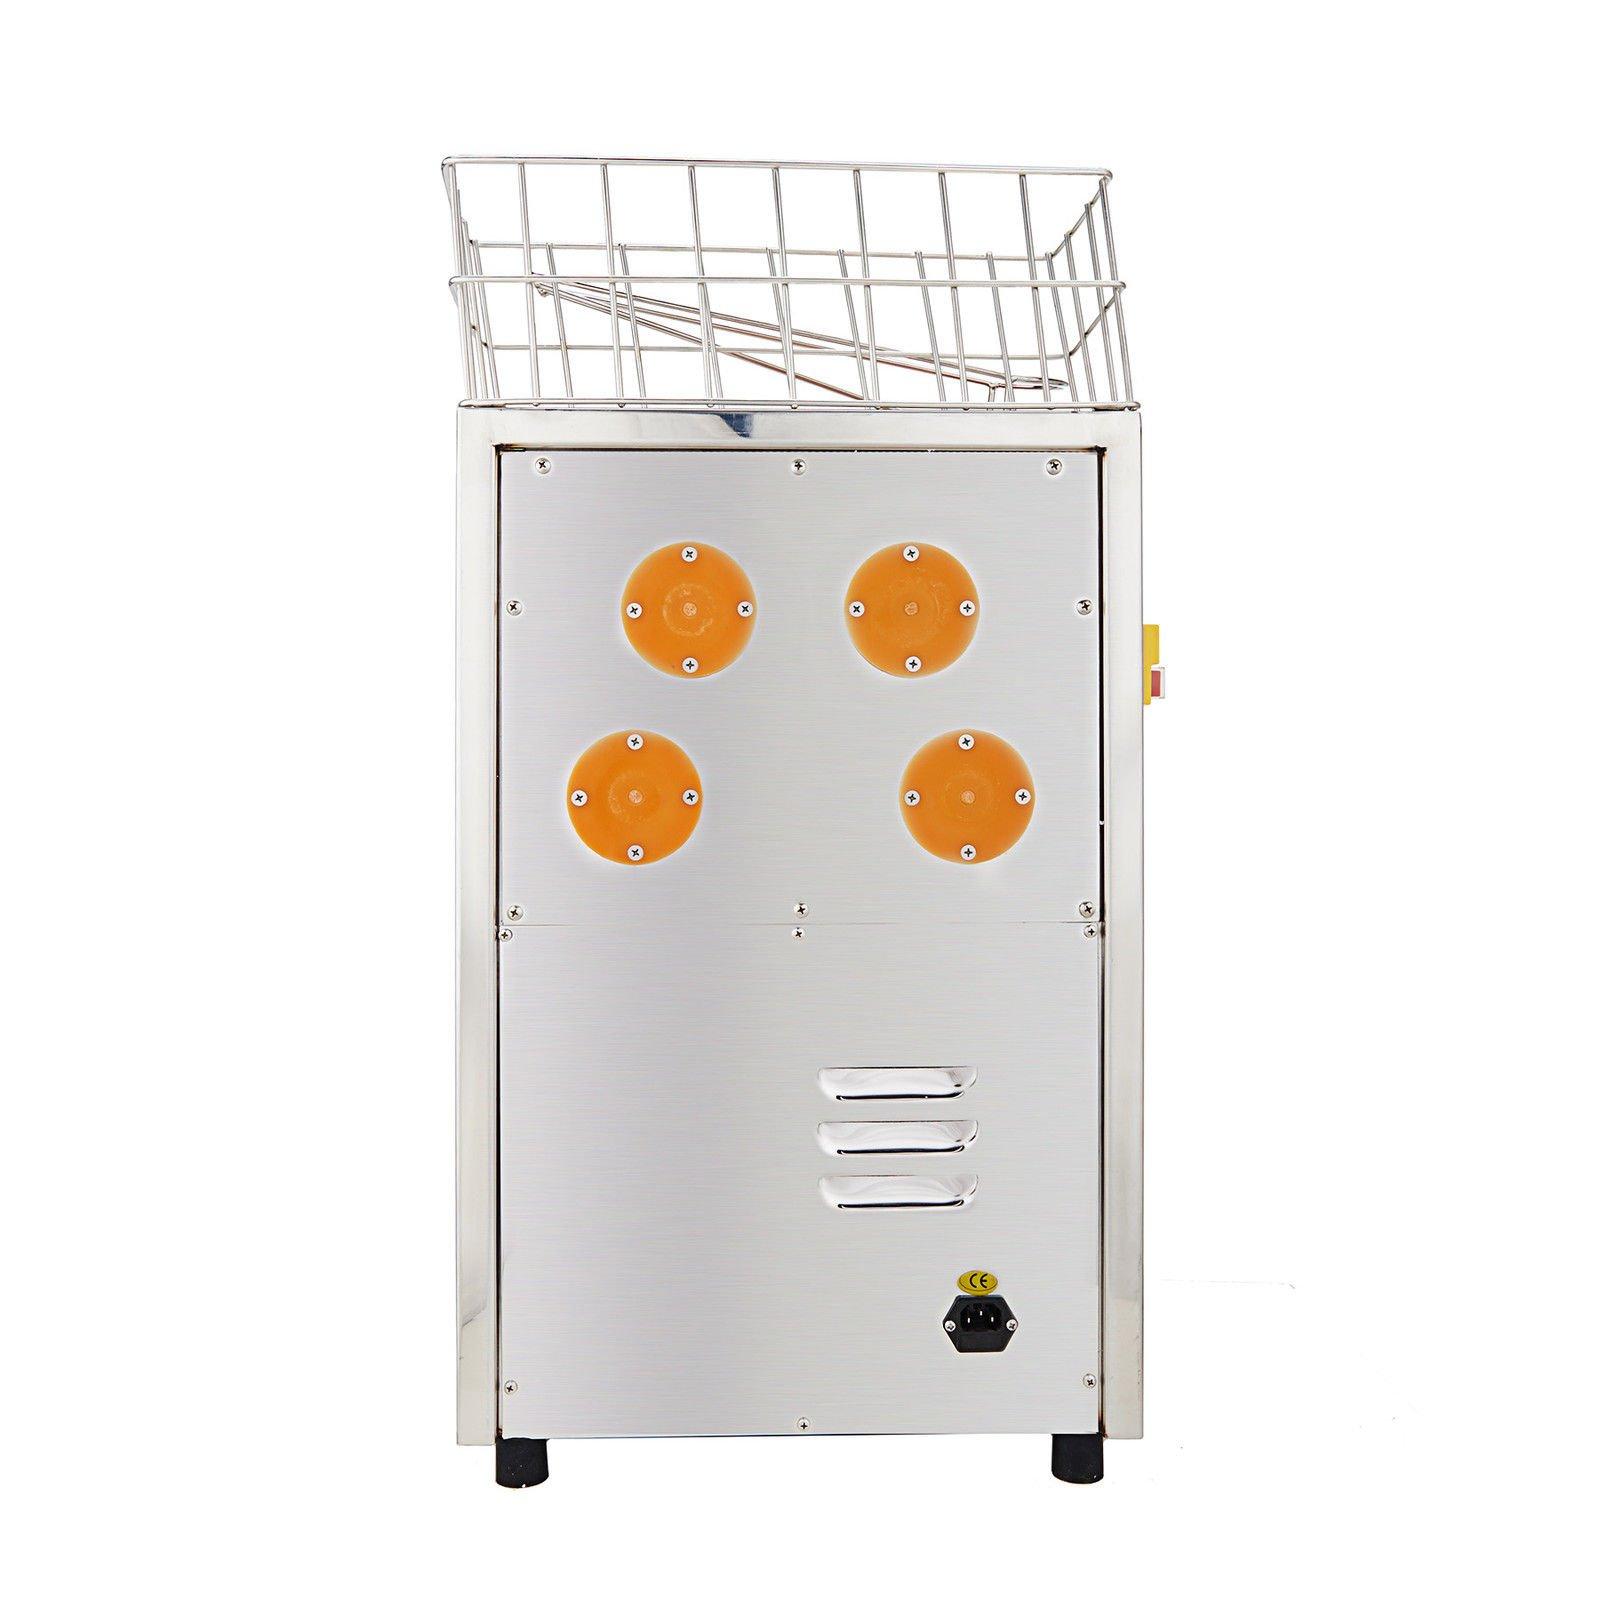 Happybuy Orange Juicer Orange Squeezer Machine Citrus Juicer Electric Fruit Juicer Machine Citrus Lemon Lime Automatic Auto Feed Commercial (Stainless Steel tank) by Happybuy (Image #4)